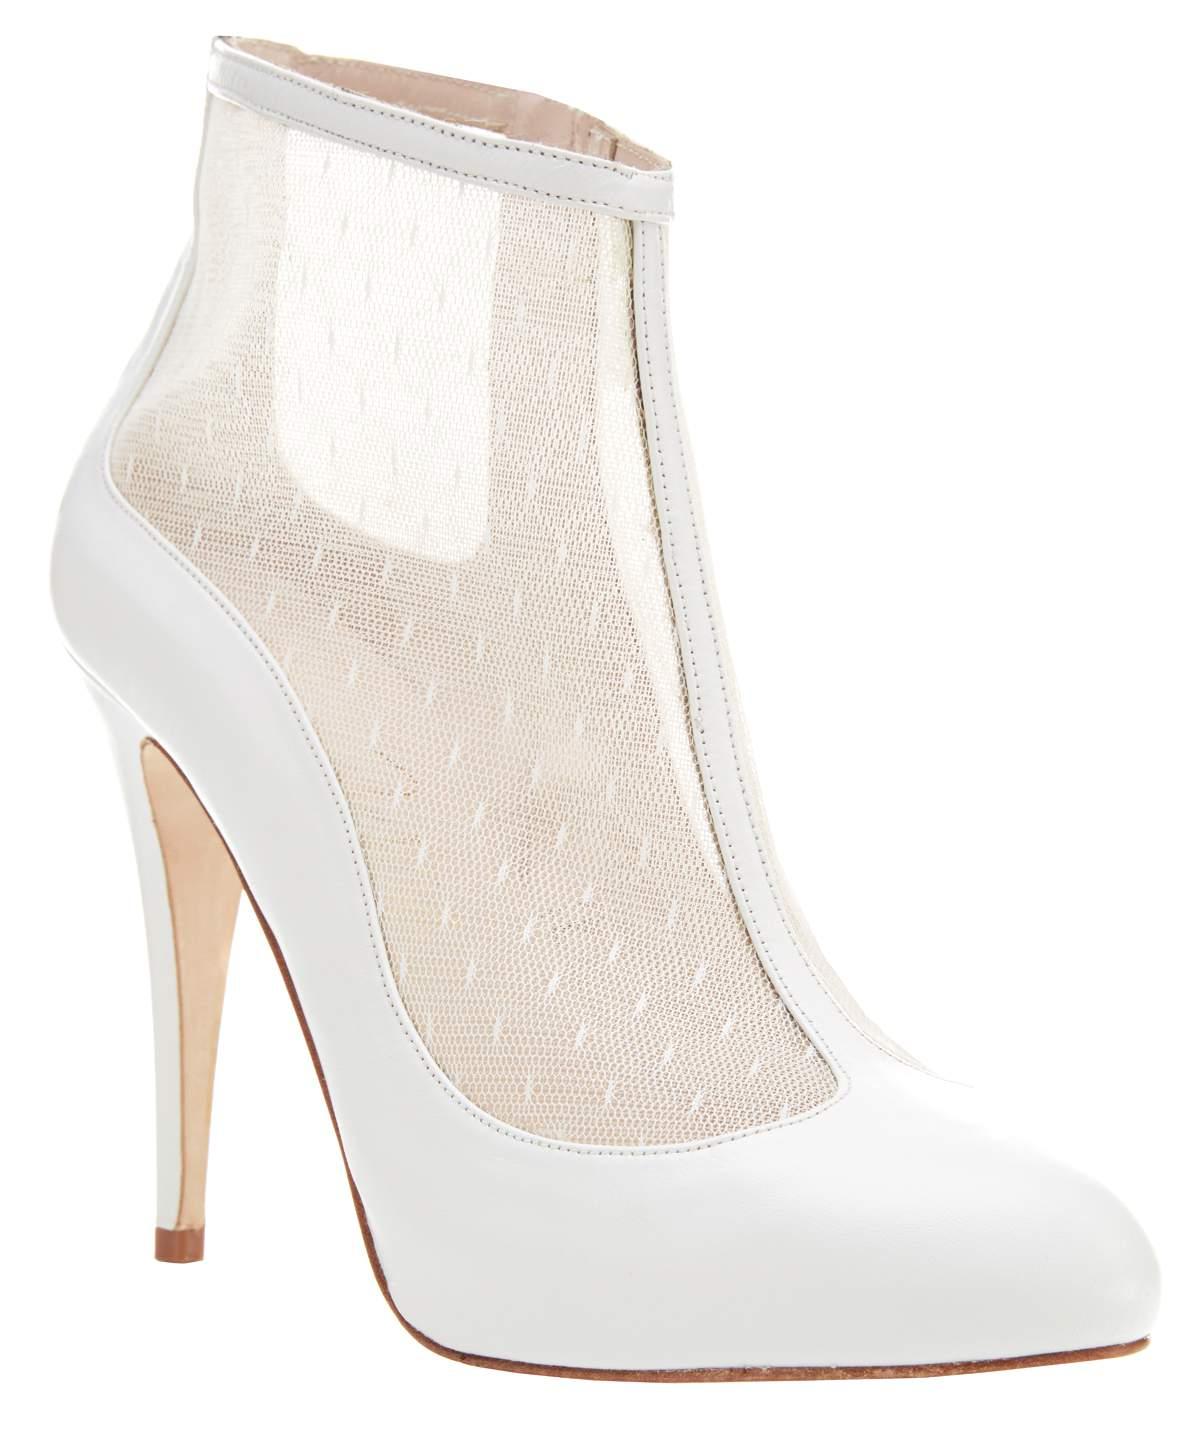 Harriet Wilde shoes HONEY IVORY, £229.99